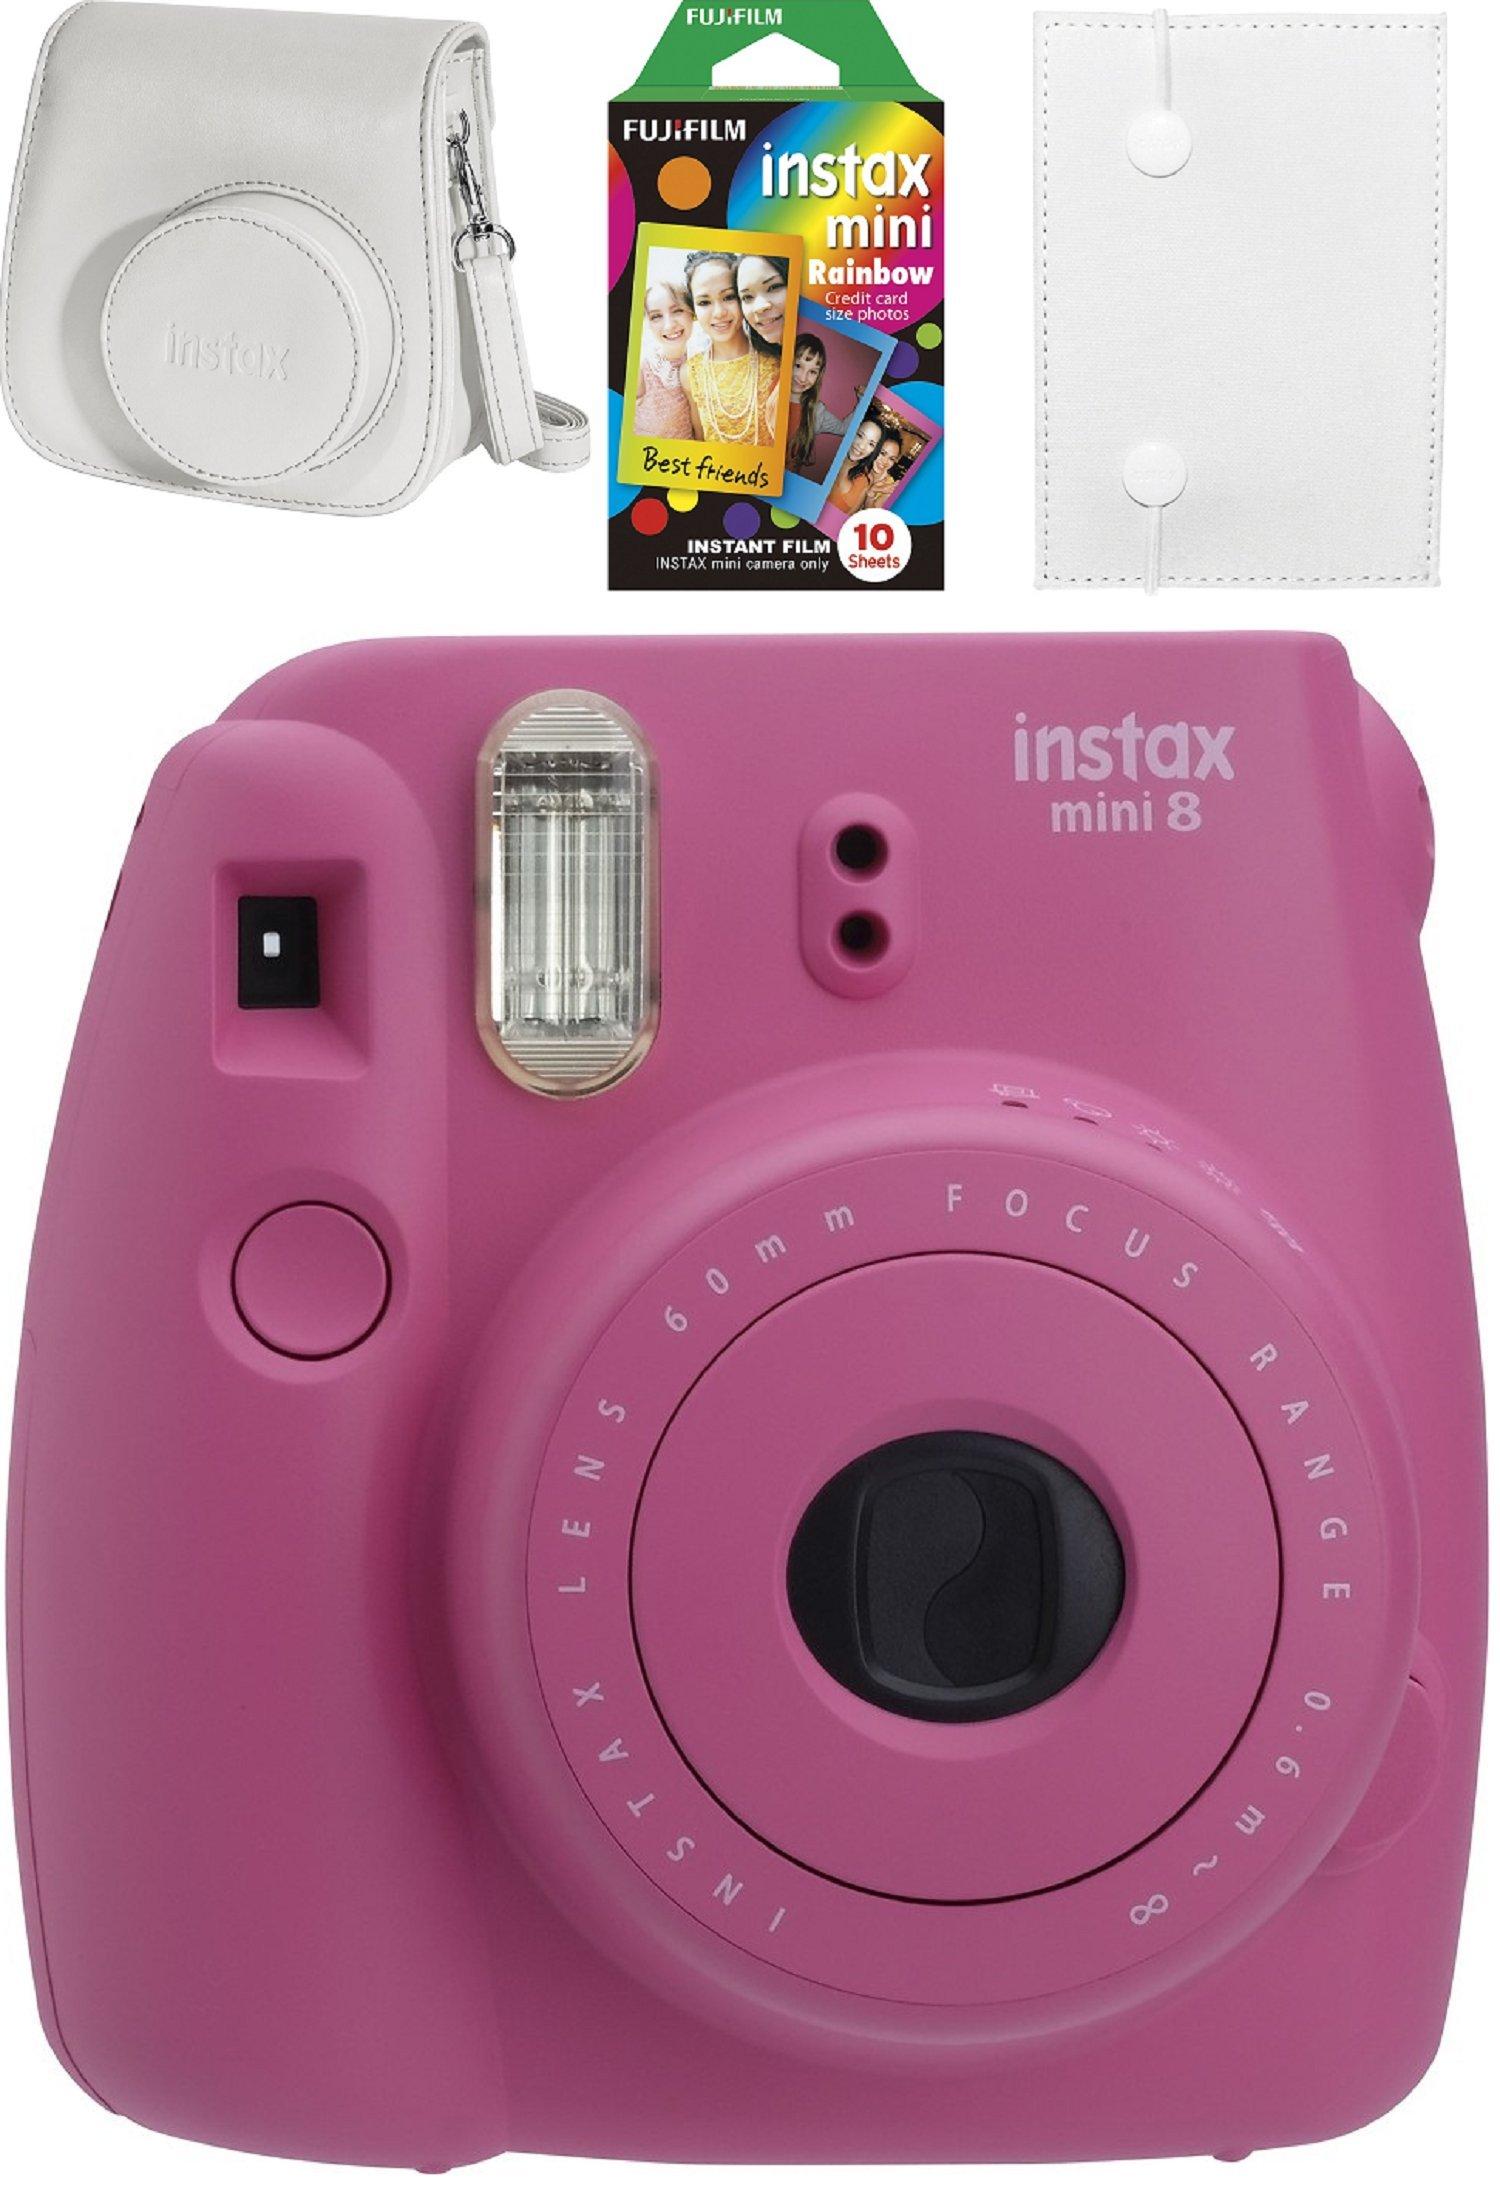 Fujifilm - Instax mini 8 Instant Film Camera Bundle - Hot Pink